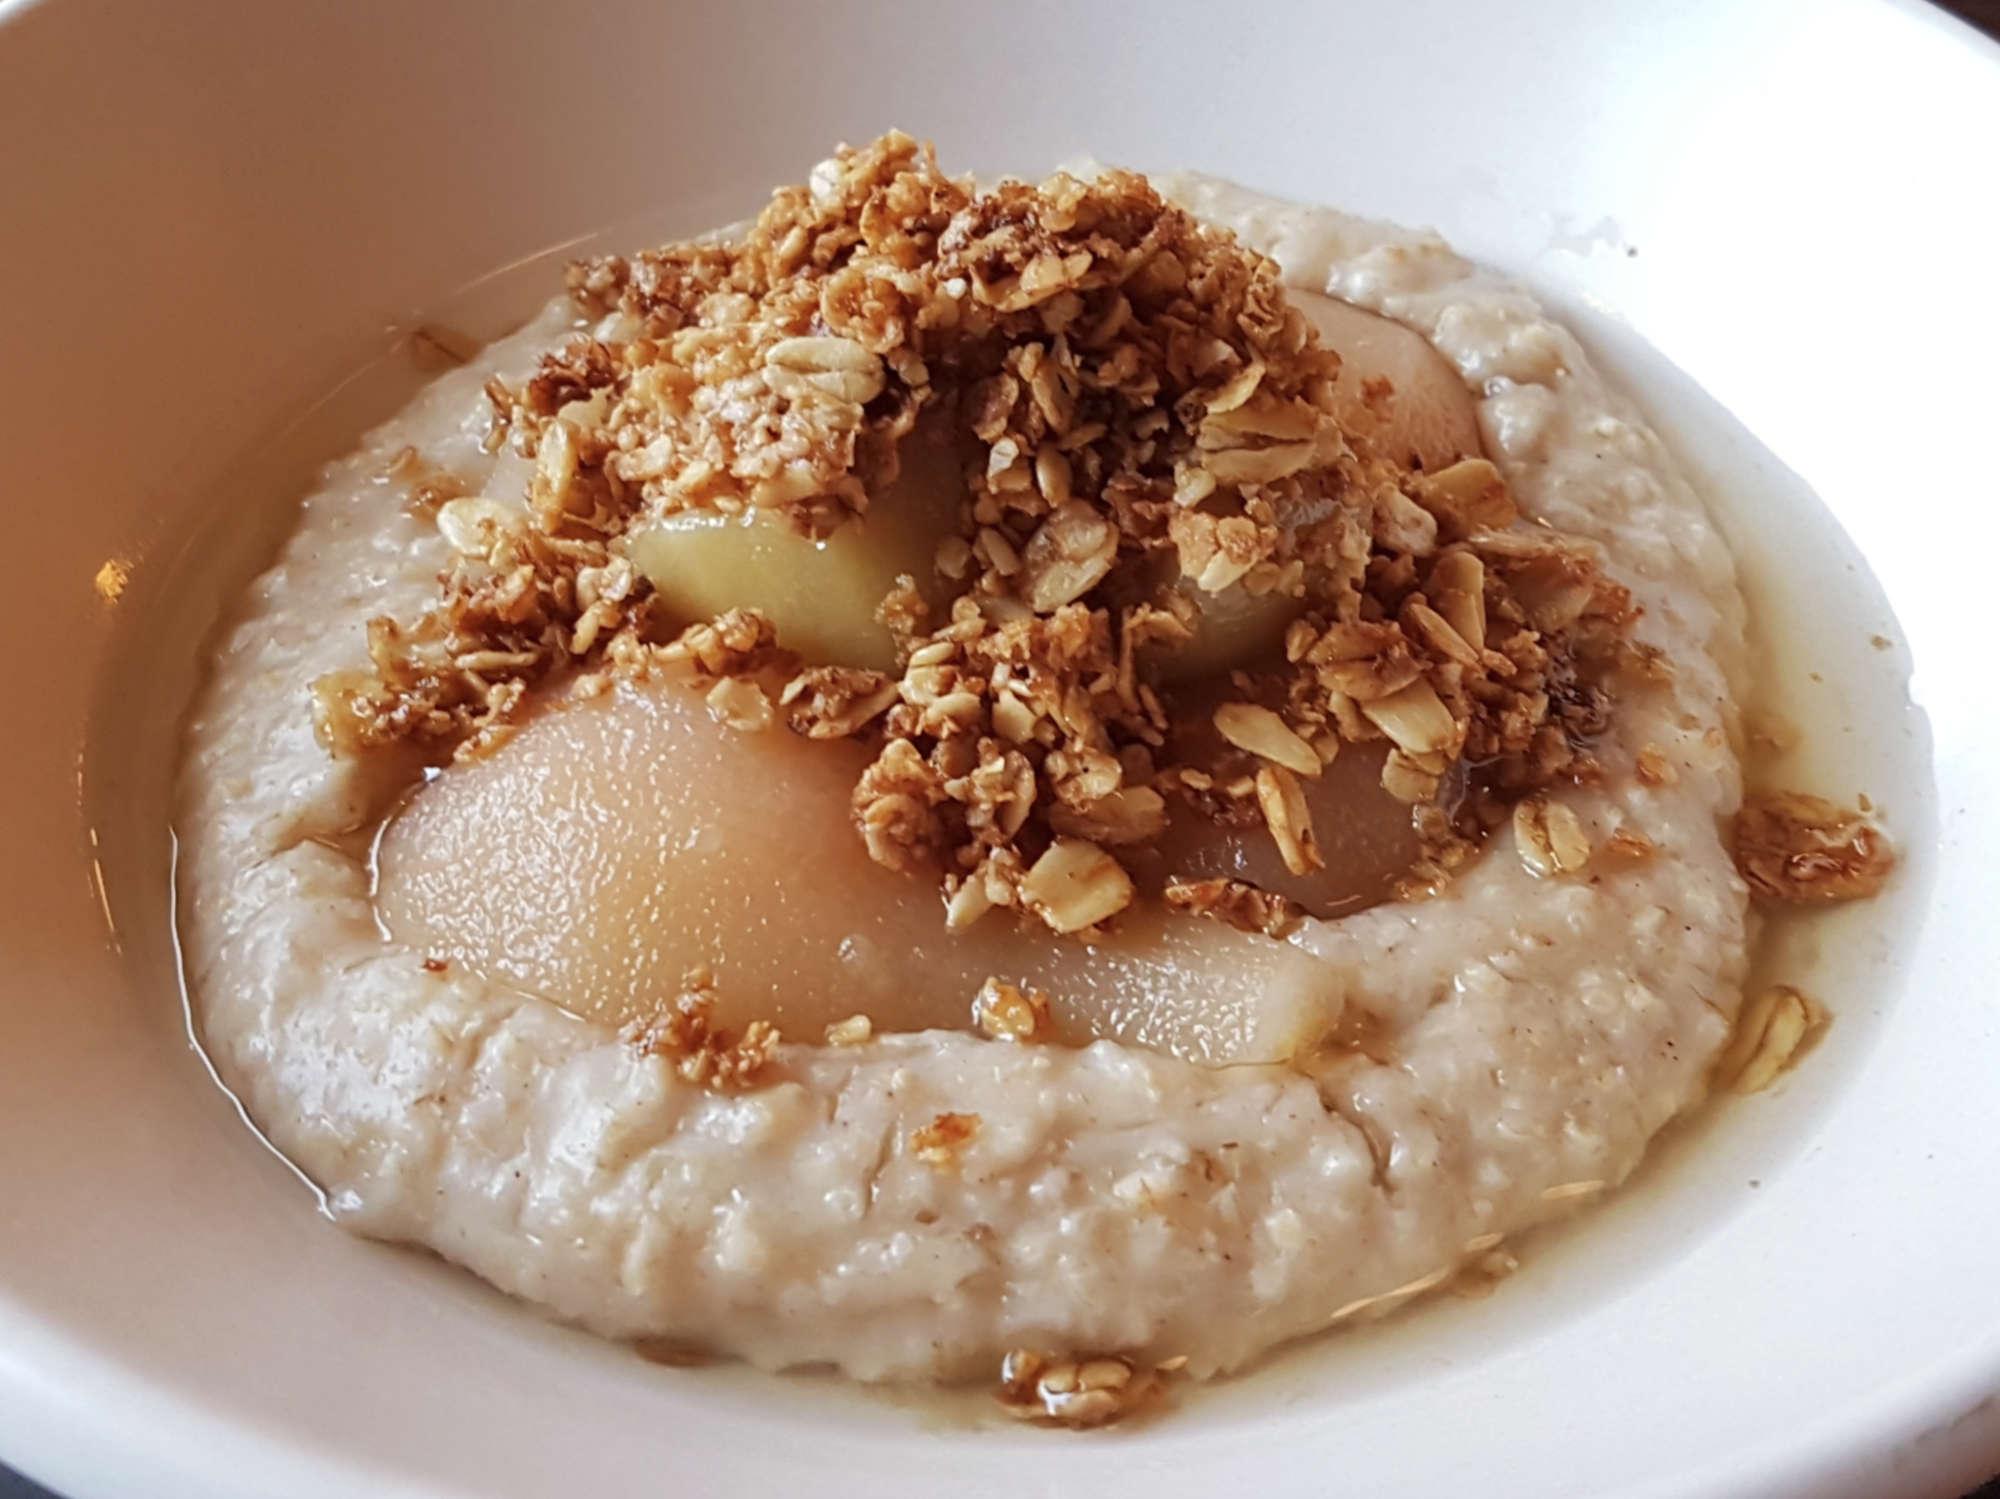 Floriditas - porridge